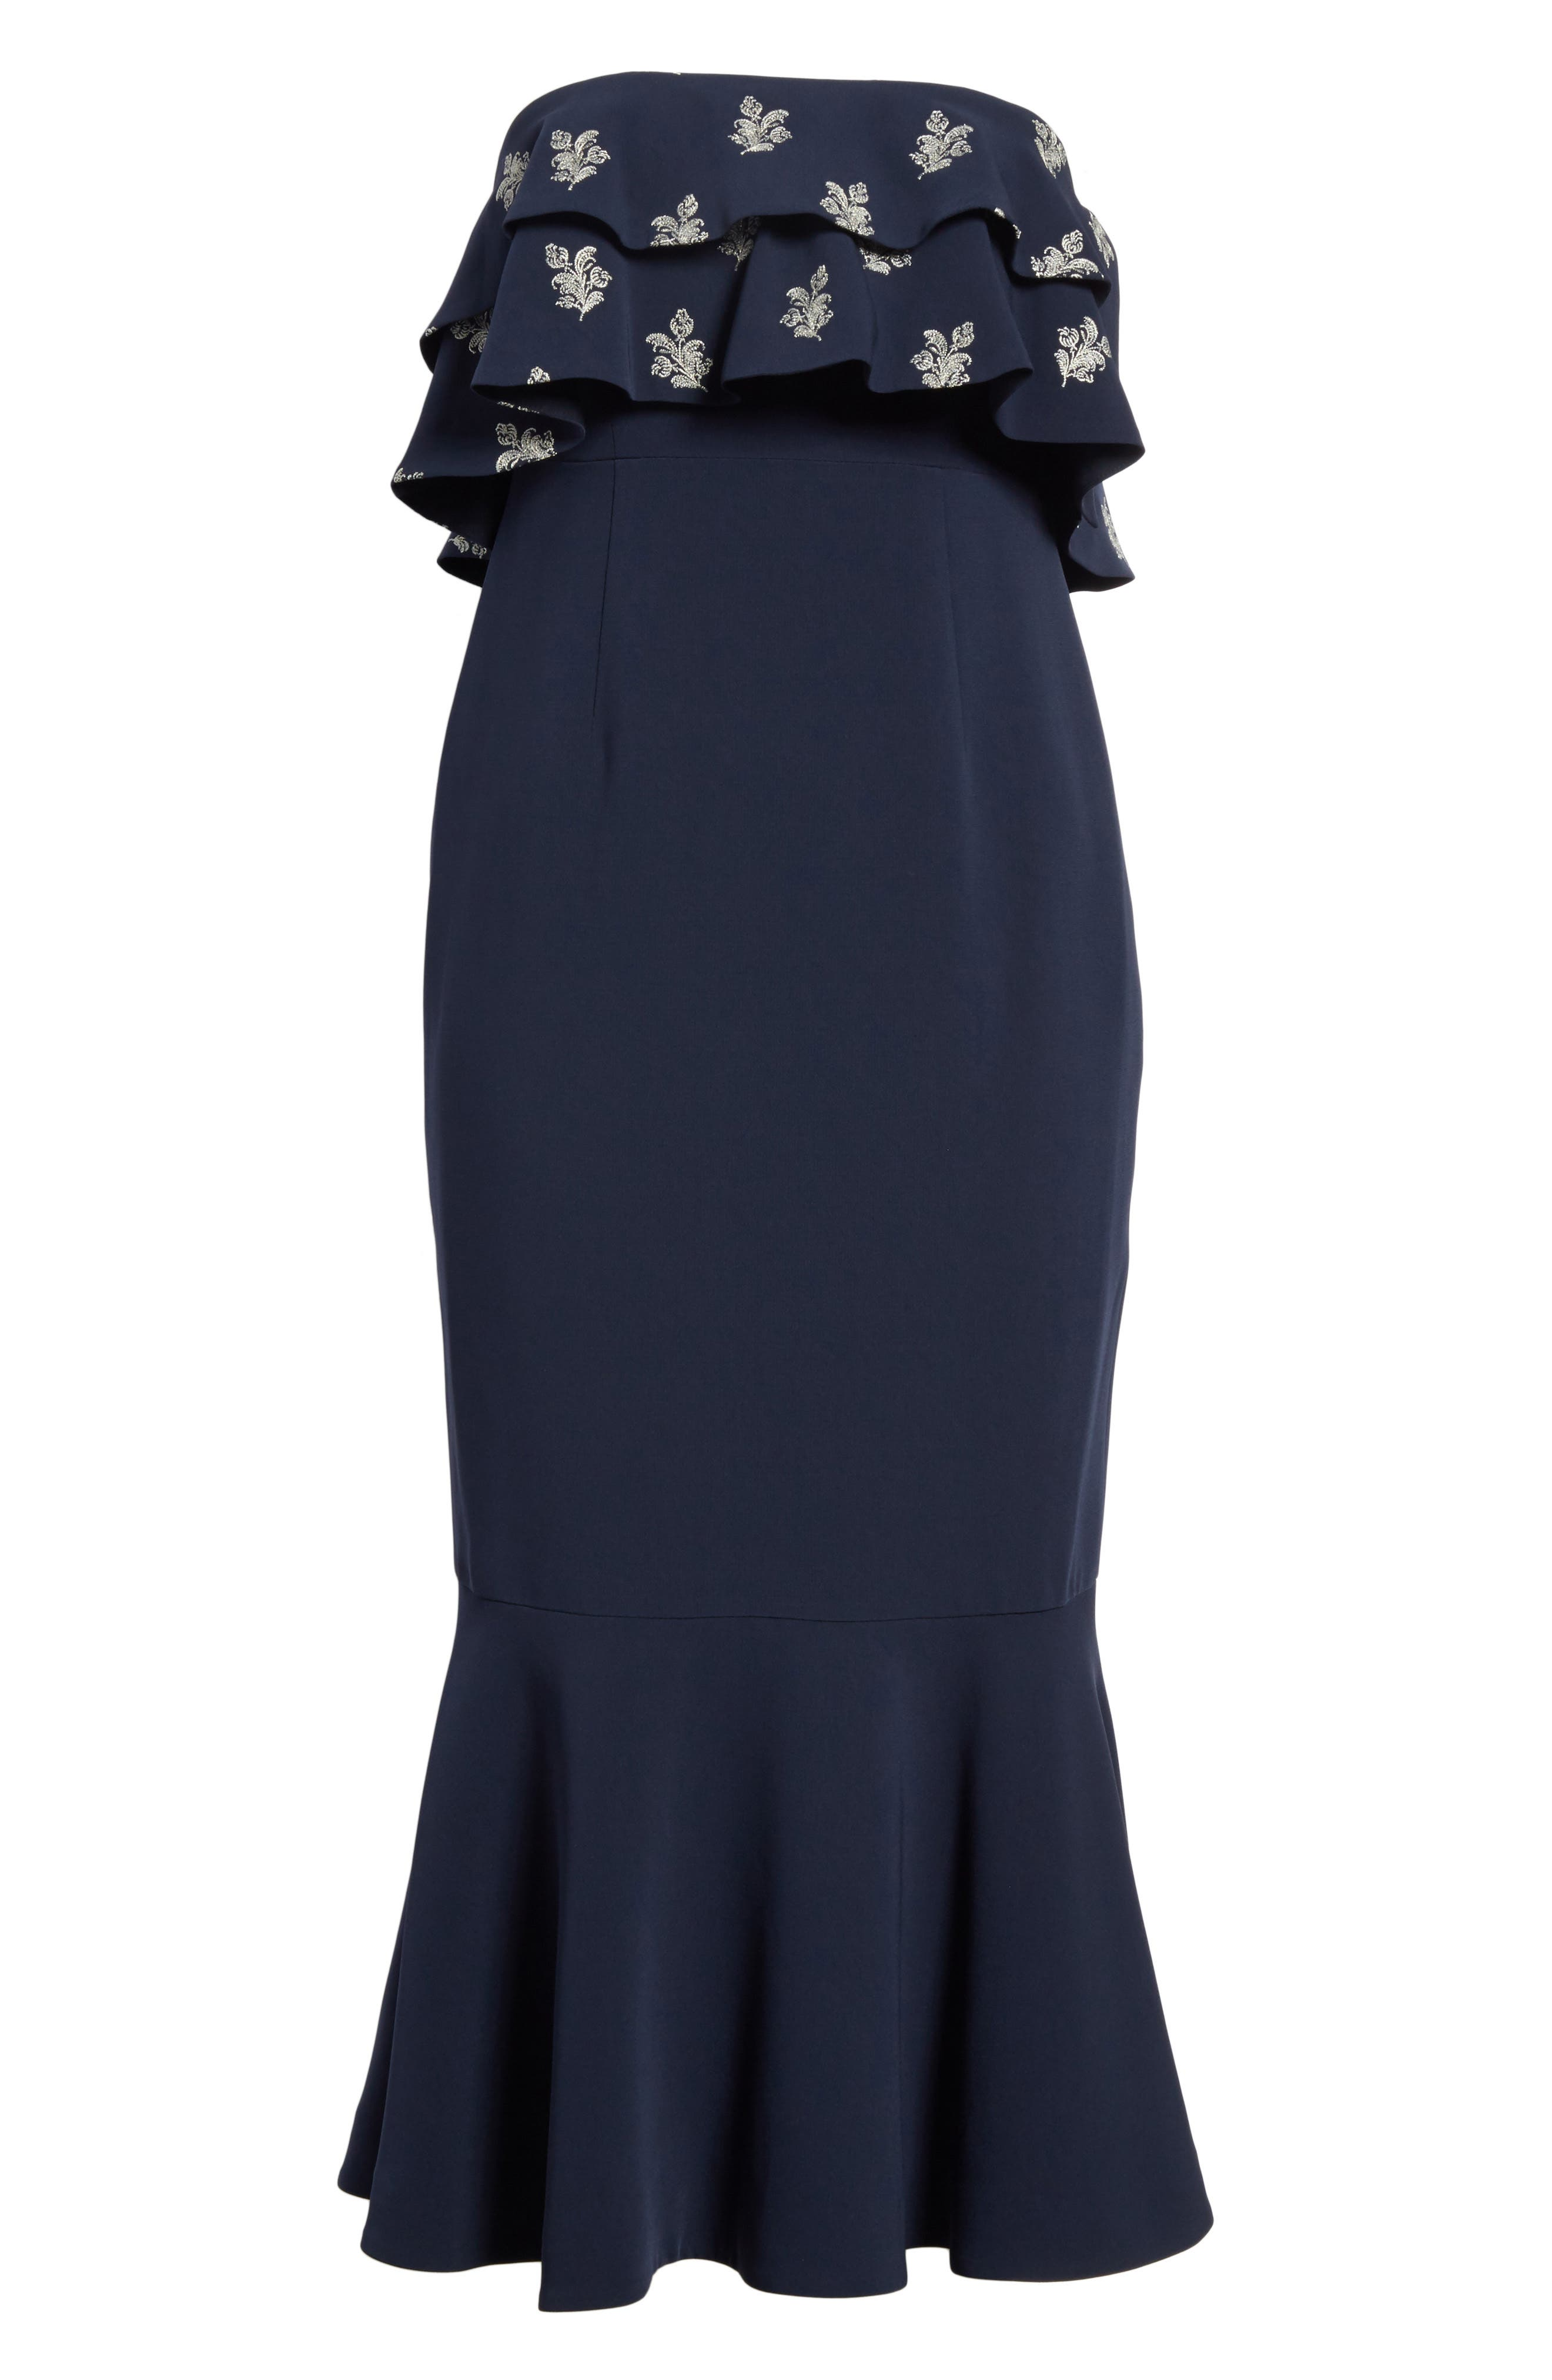 Eza Strapless Mermaid Dress,                             Alternate thumbnail 6, color,